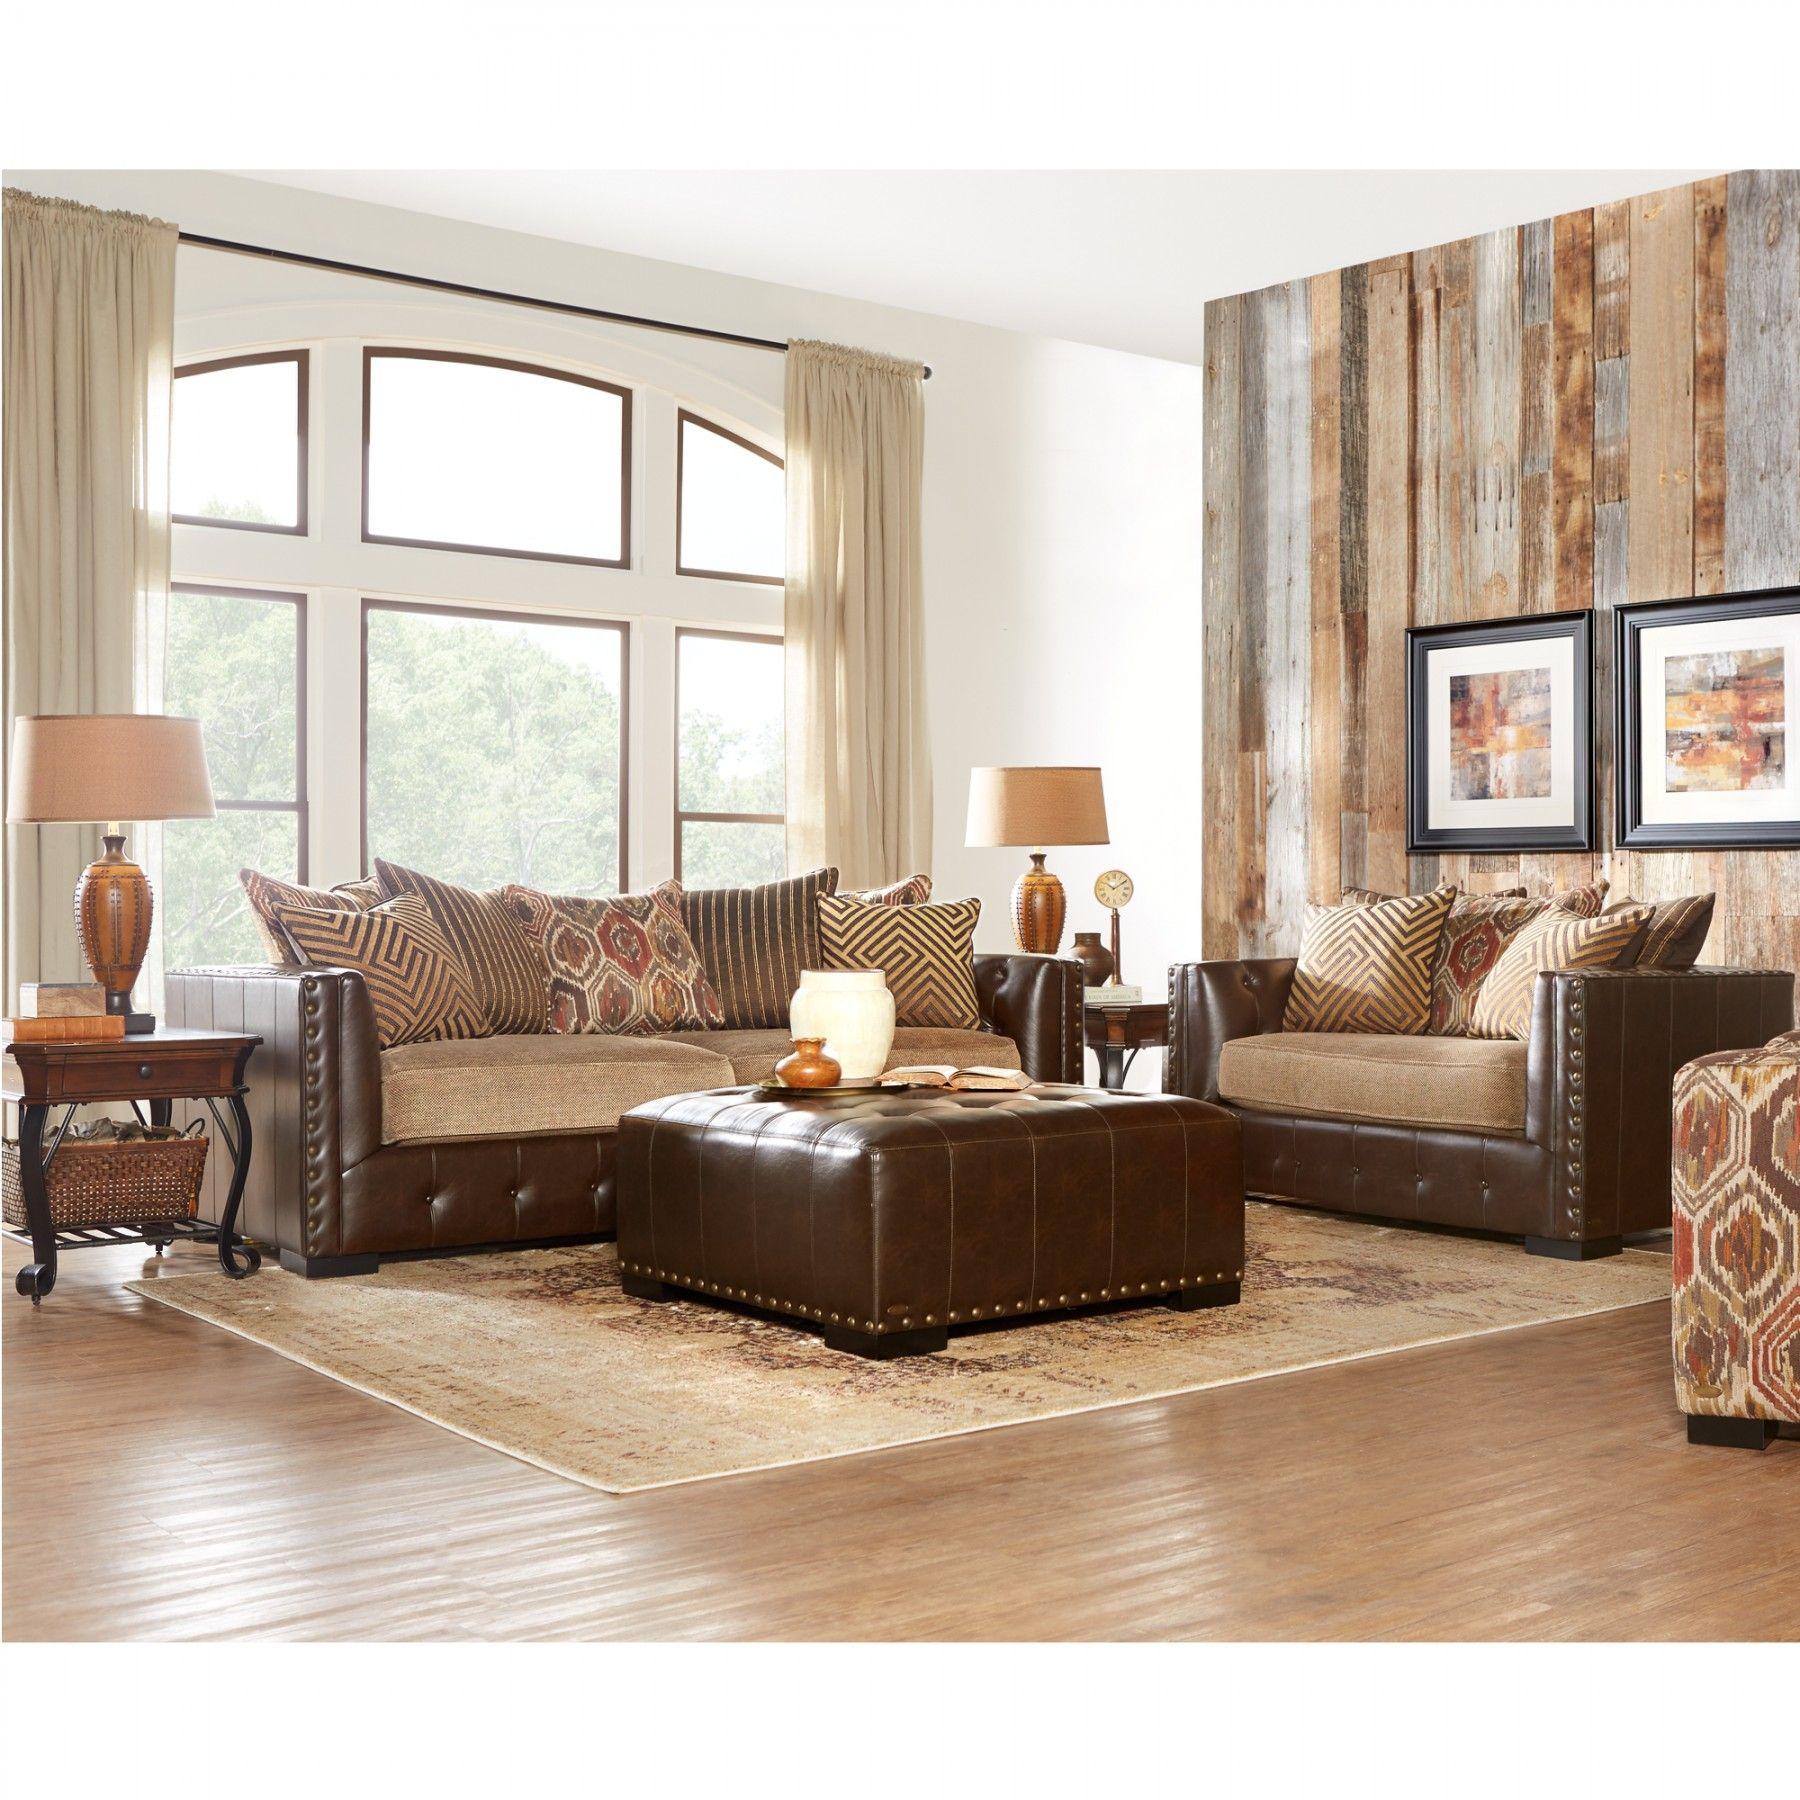 Pleasant Wunderbare Hm Richards Sofa Schreibtisch Der Sitzkomfort Gmtry Best Dining Table And Chair Ideas Images Gmtryco